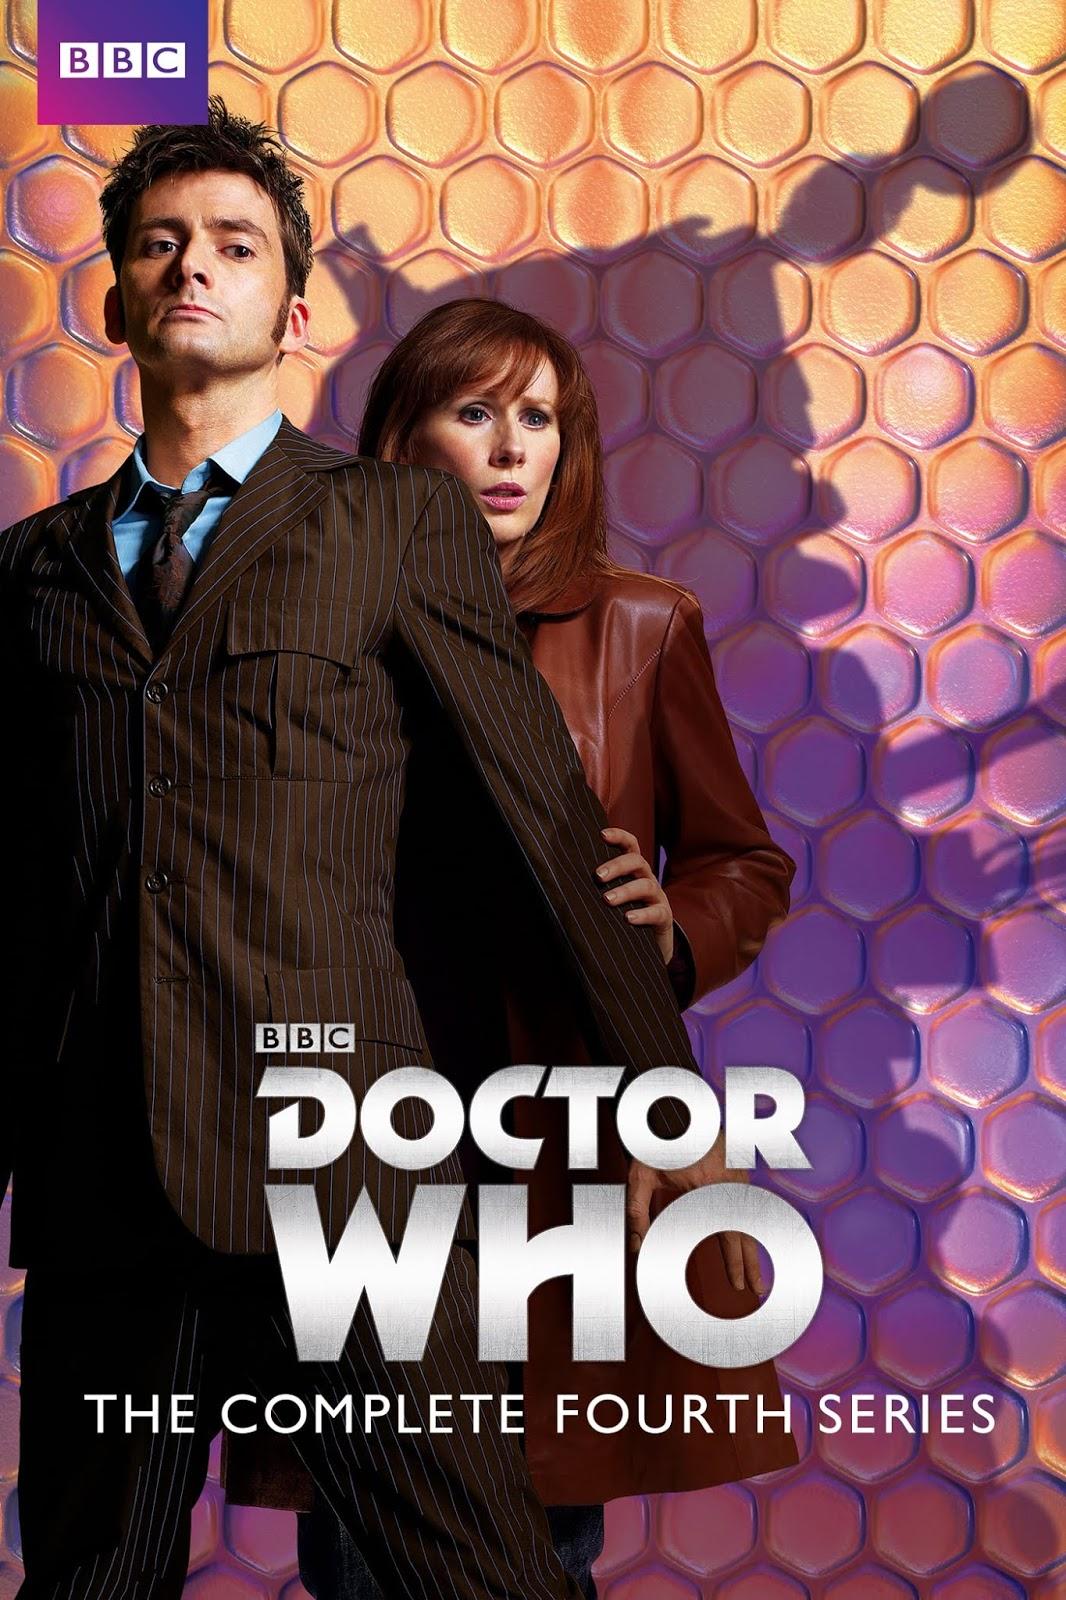 Doctor Who Temporada 4 Ingles Subtitulado // Castellano 480p